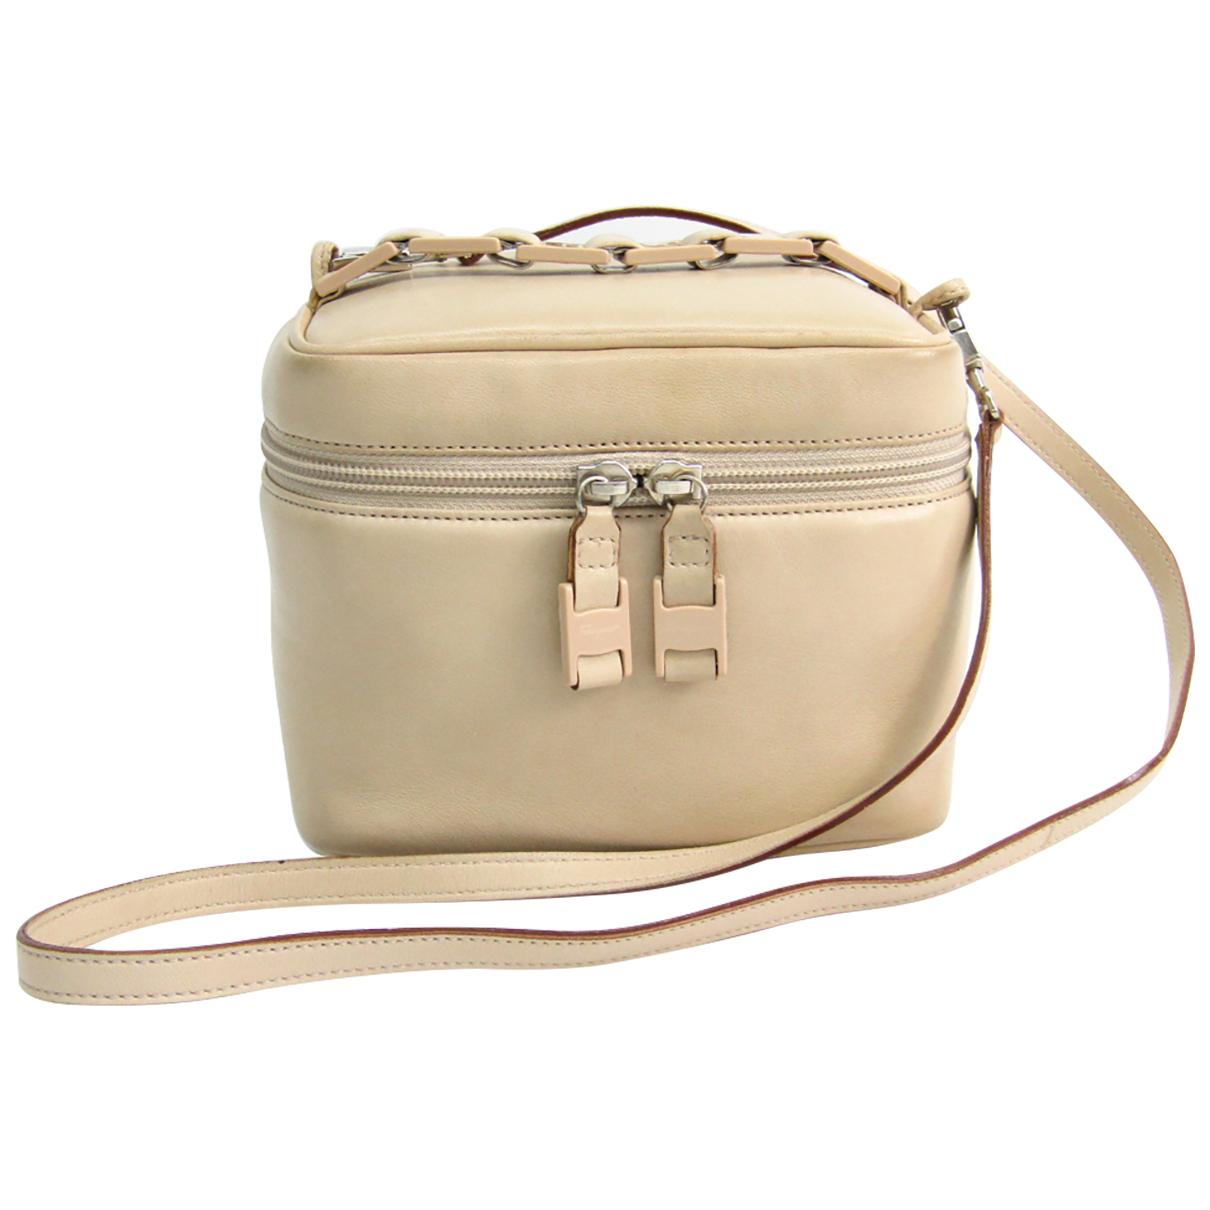 Salvatore Ferragamo Vara Beige Leather handbag for Women N